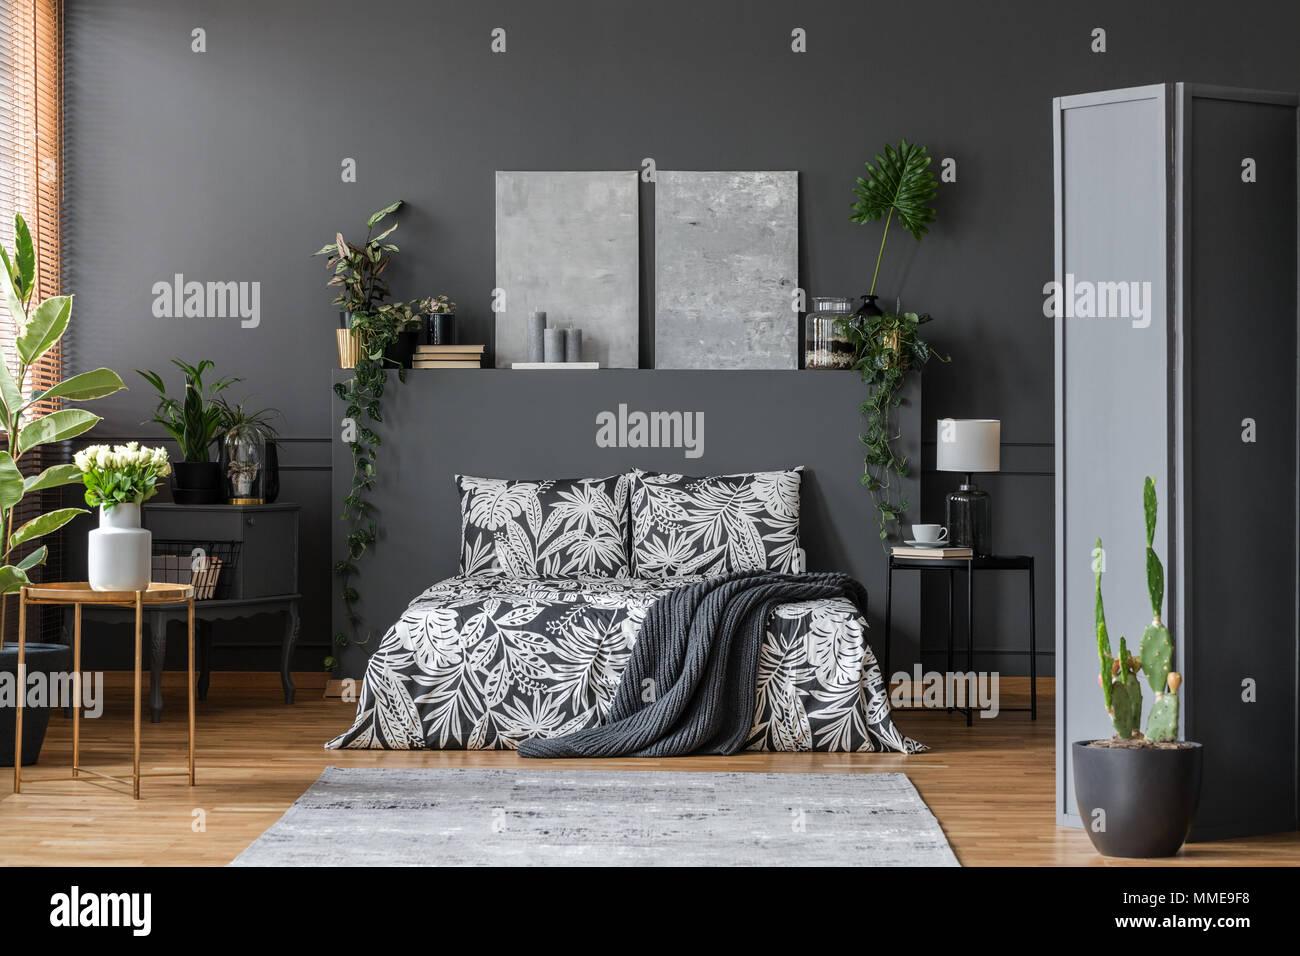 Floral pattern black bedding in a stylish, dark gray bedroom ...